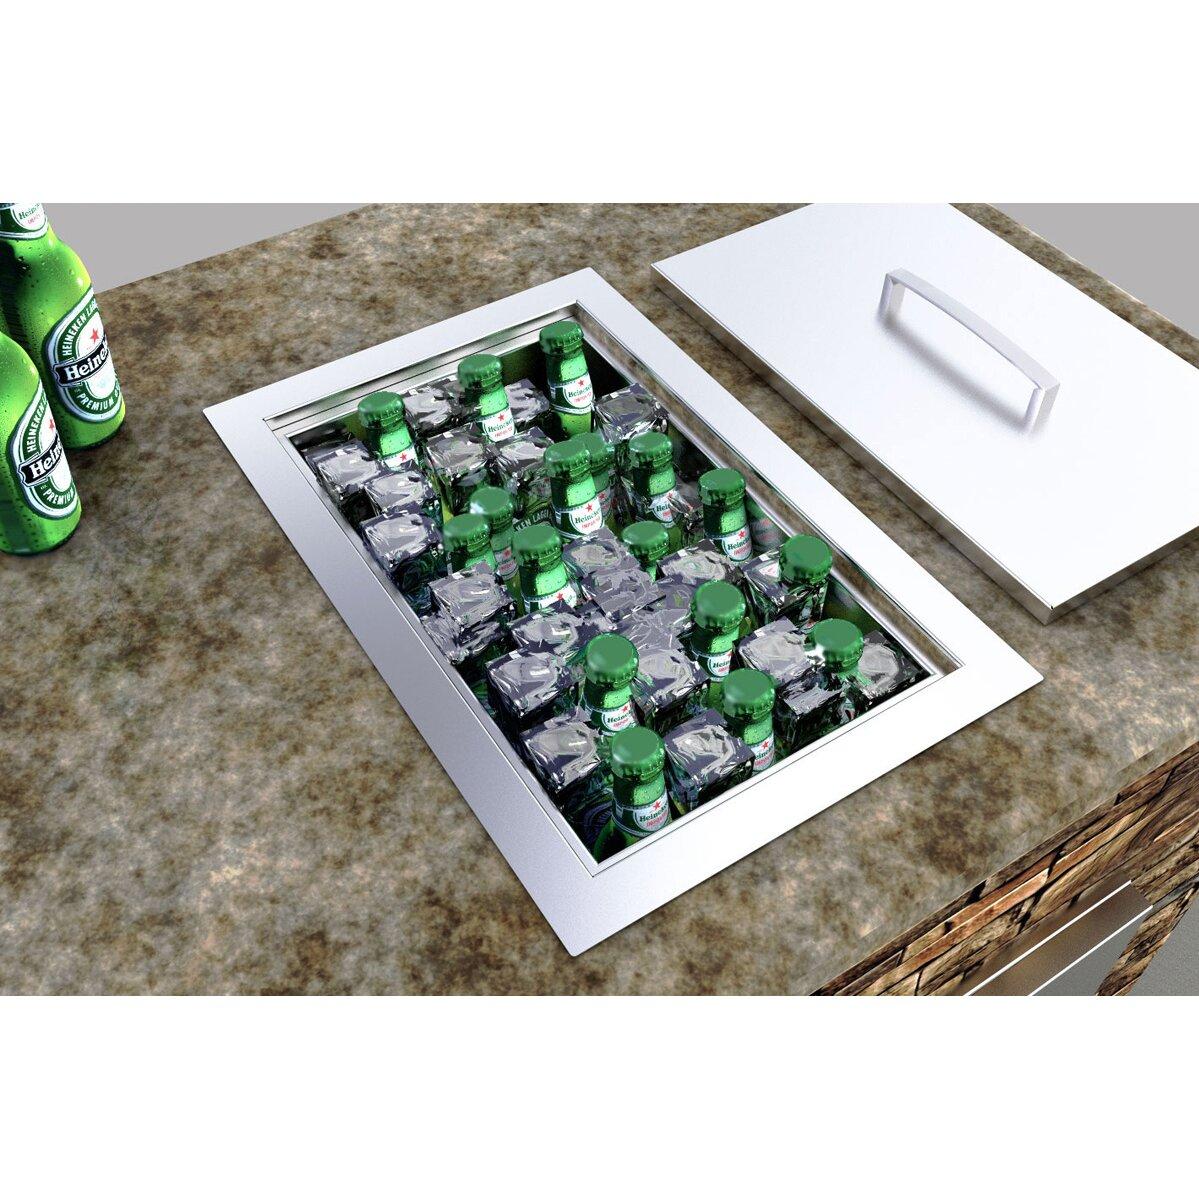 Sunstone Grills Outdoor Kitchen Single Basin Insulated Ice